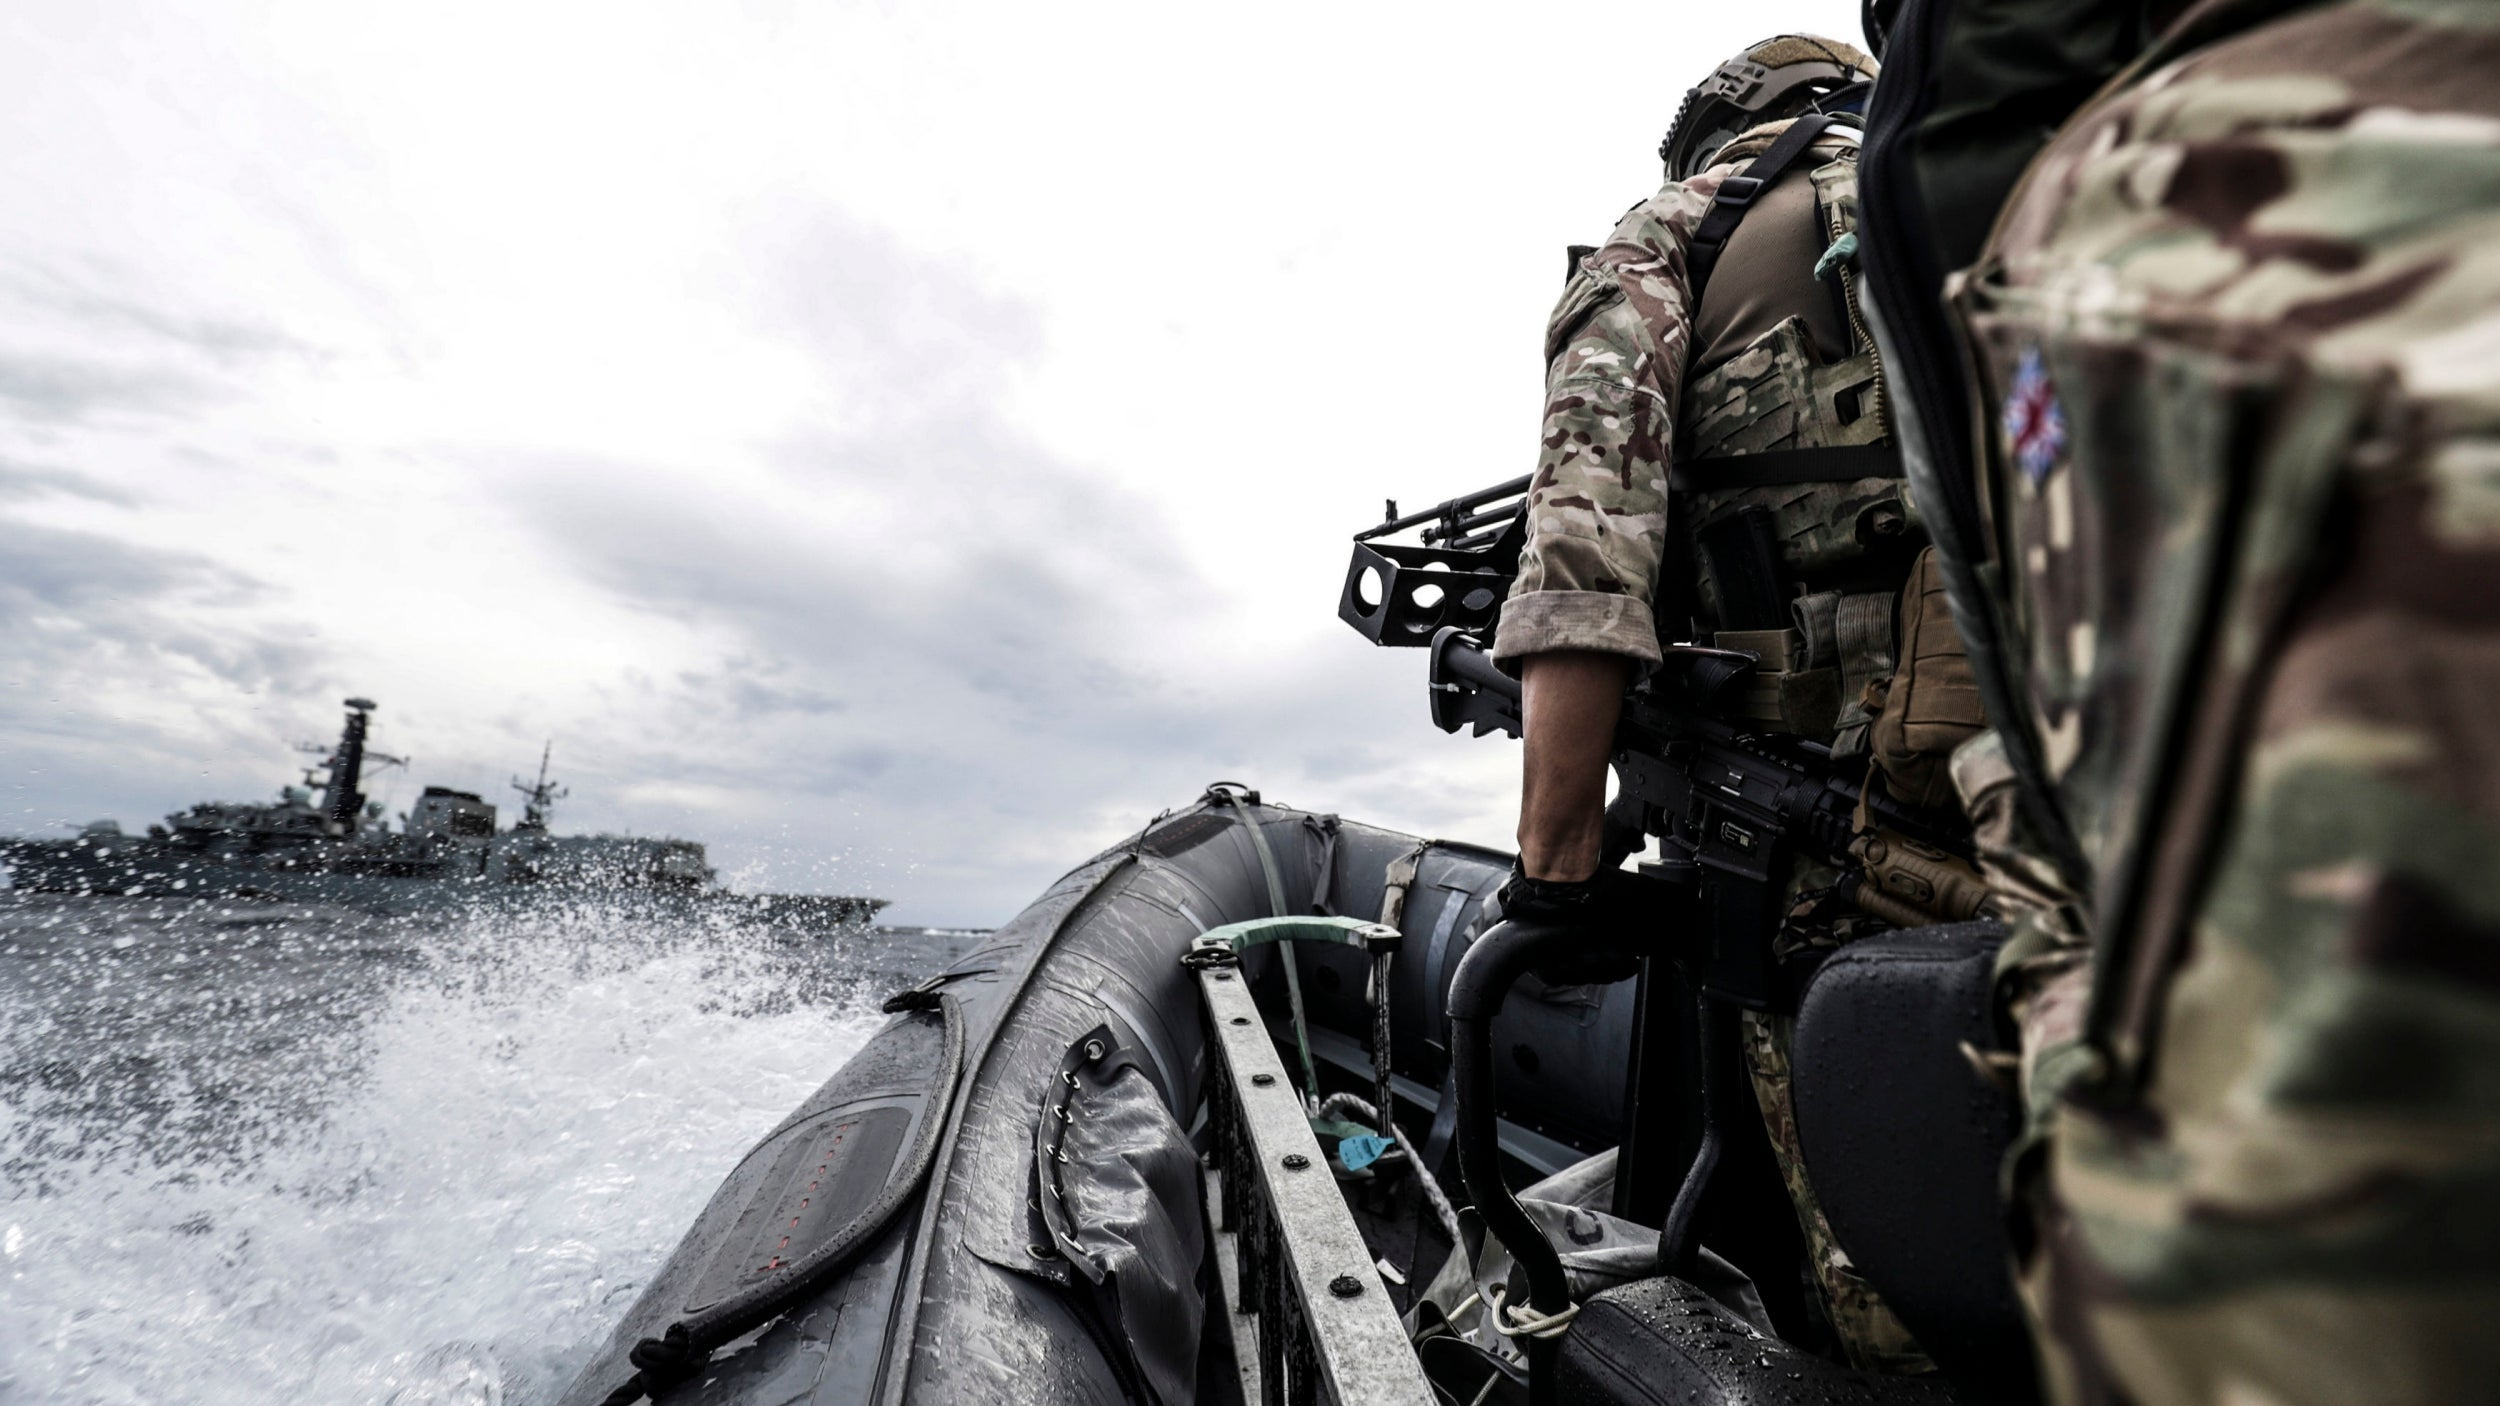 Brexit Party MEP says Royal Navy should attack EU fishing boats